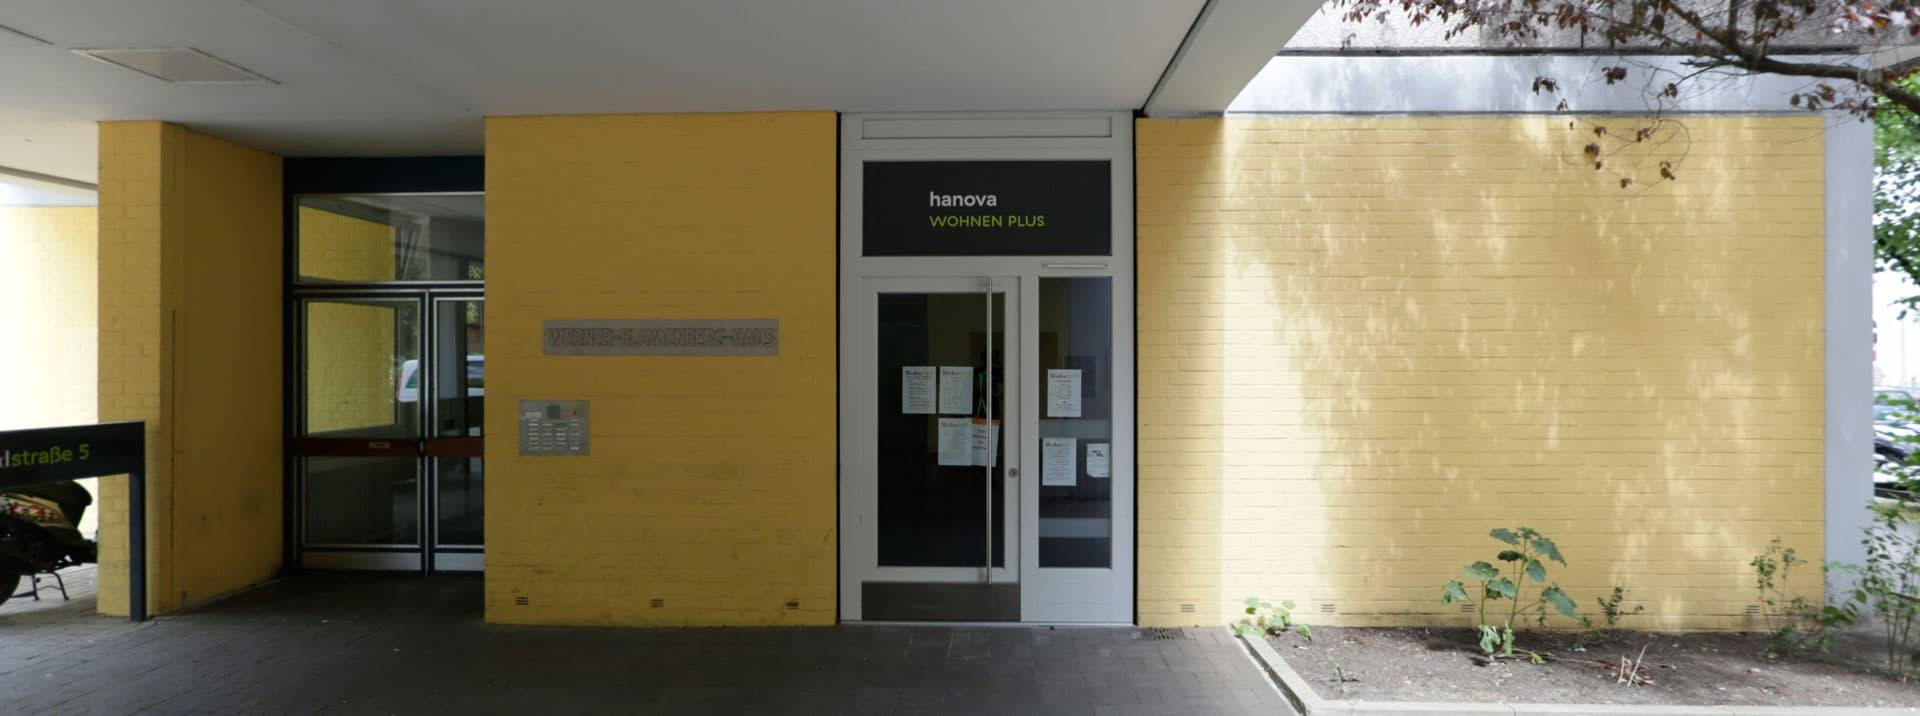 Werner Bumberg Haus ohne Grafftii